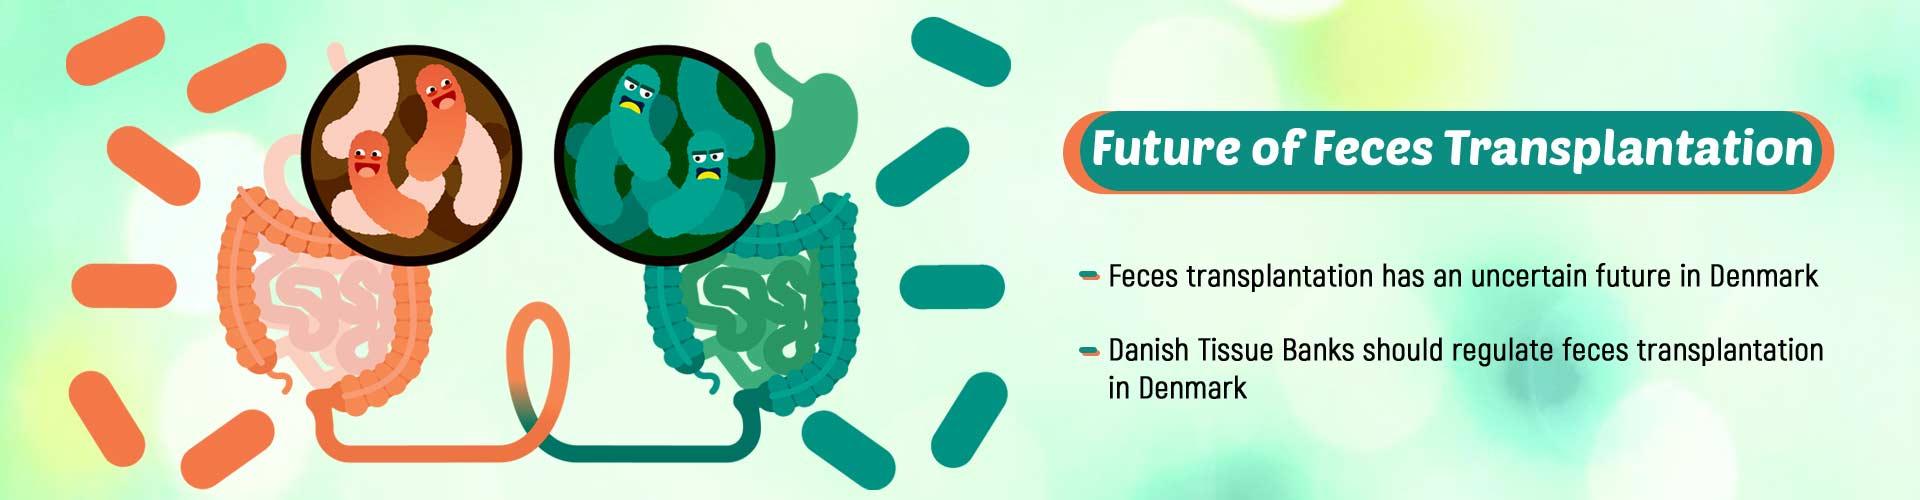 Feces Transplantation: Its Future in Denmark